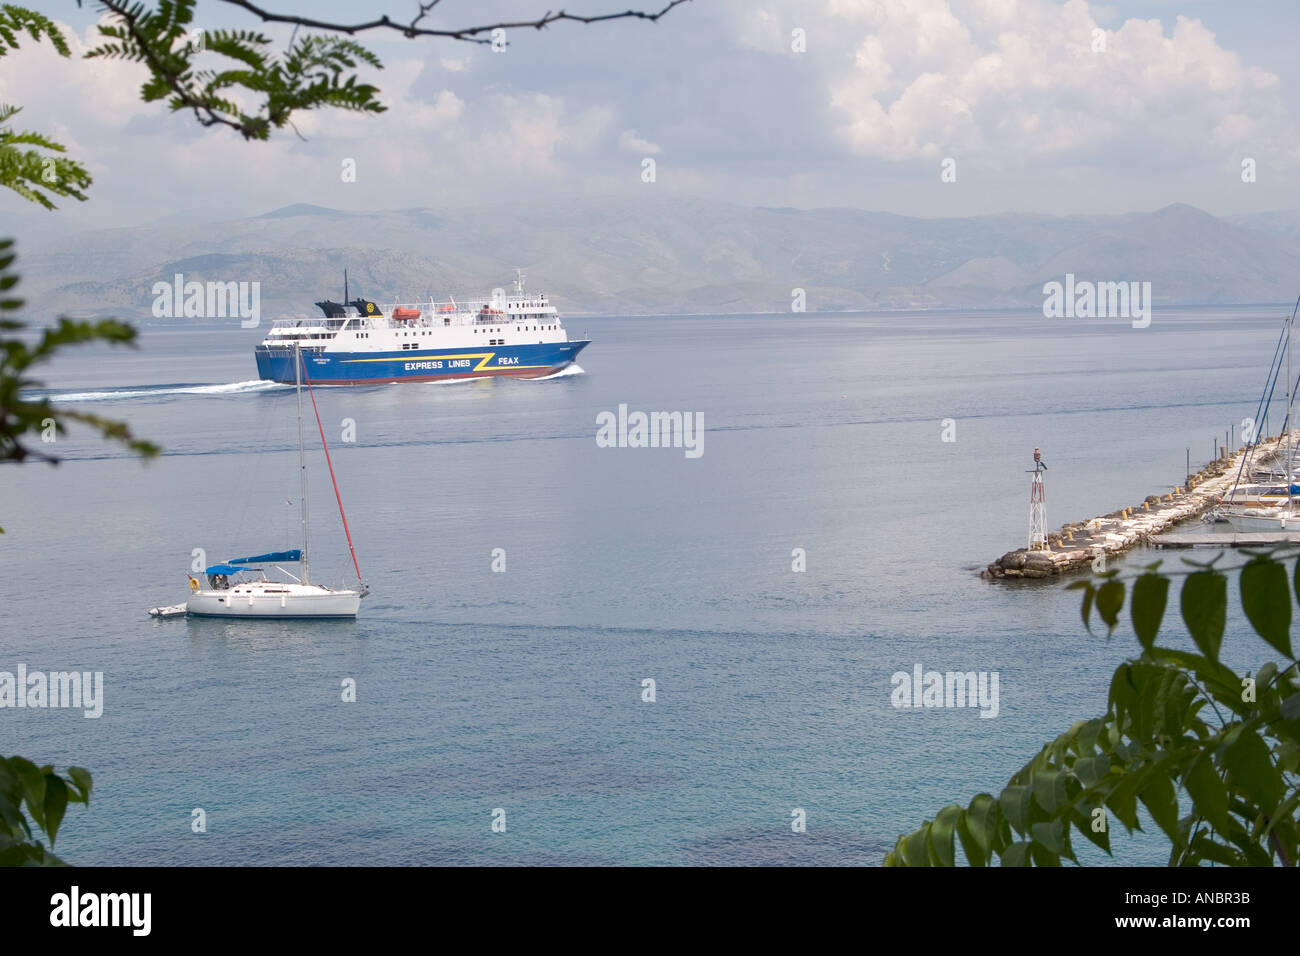 Boats in the Ionian Sea, Kerkyra, Corfu, Greece, express lines feax ferry boat yacht sailing sail moored mooring - Stock Image